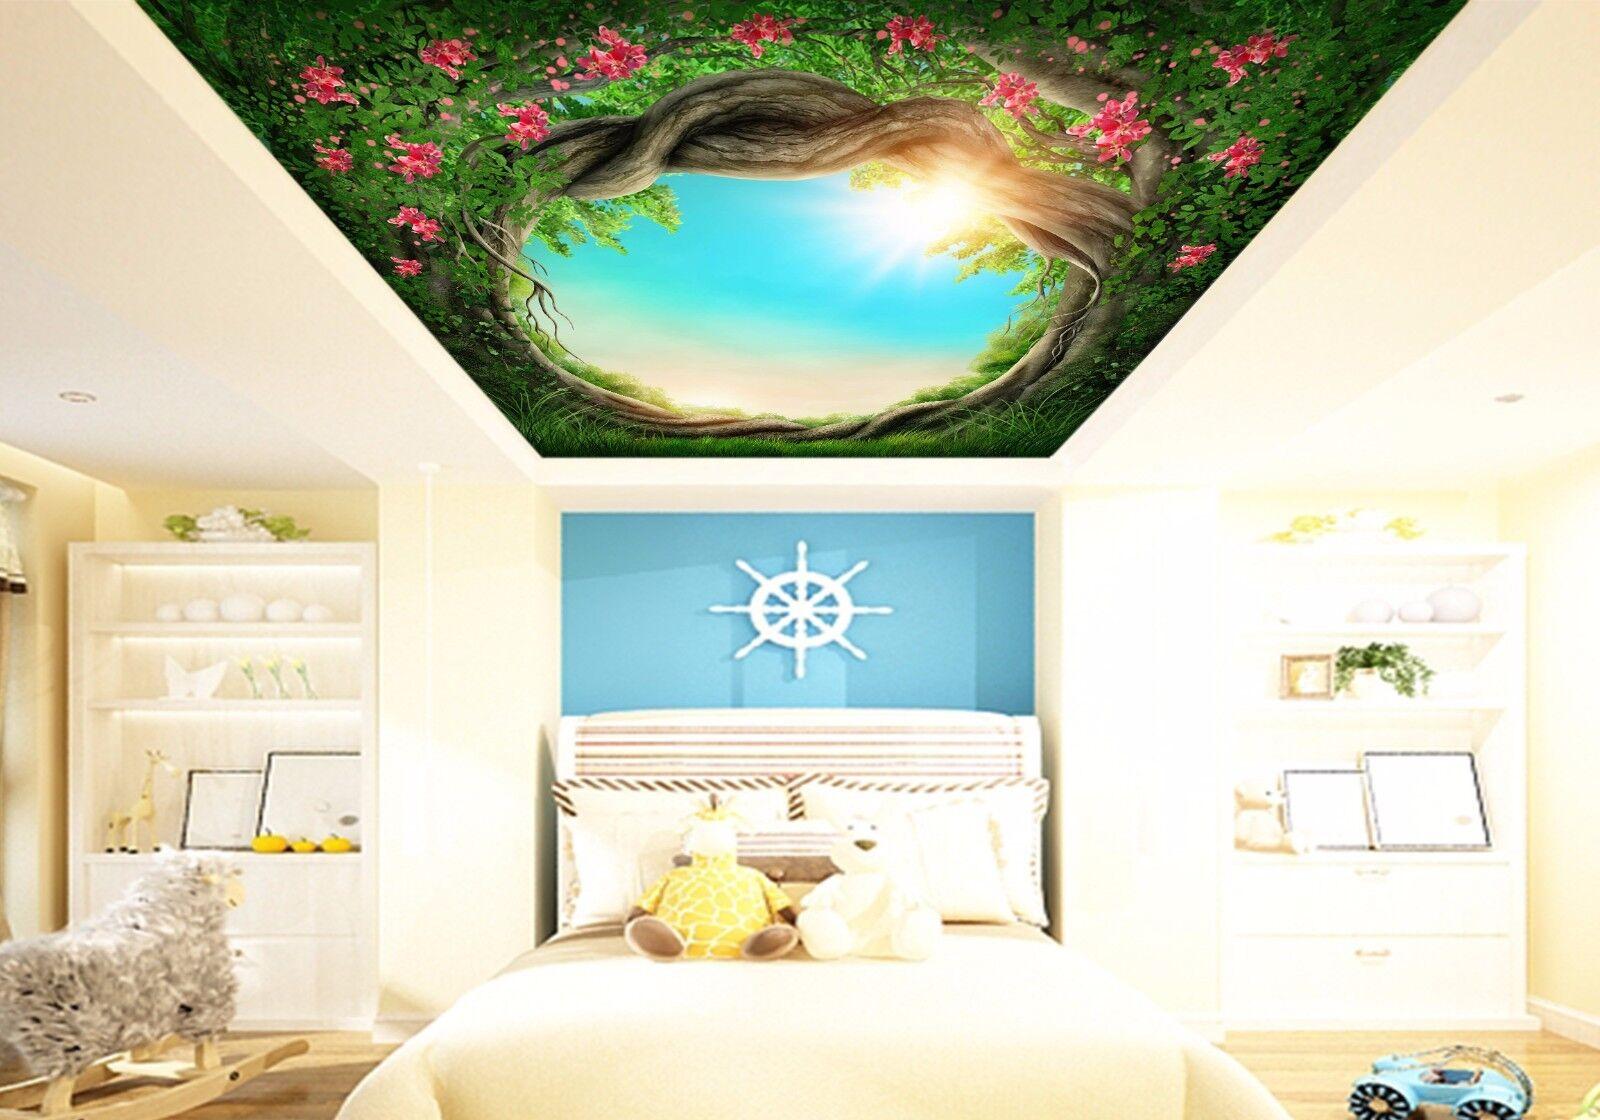 3D Grass Fowers 7554 Ceiling WallPaper Murals Wall Print Decal Deco AJ WALLPAPER